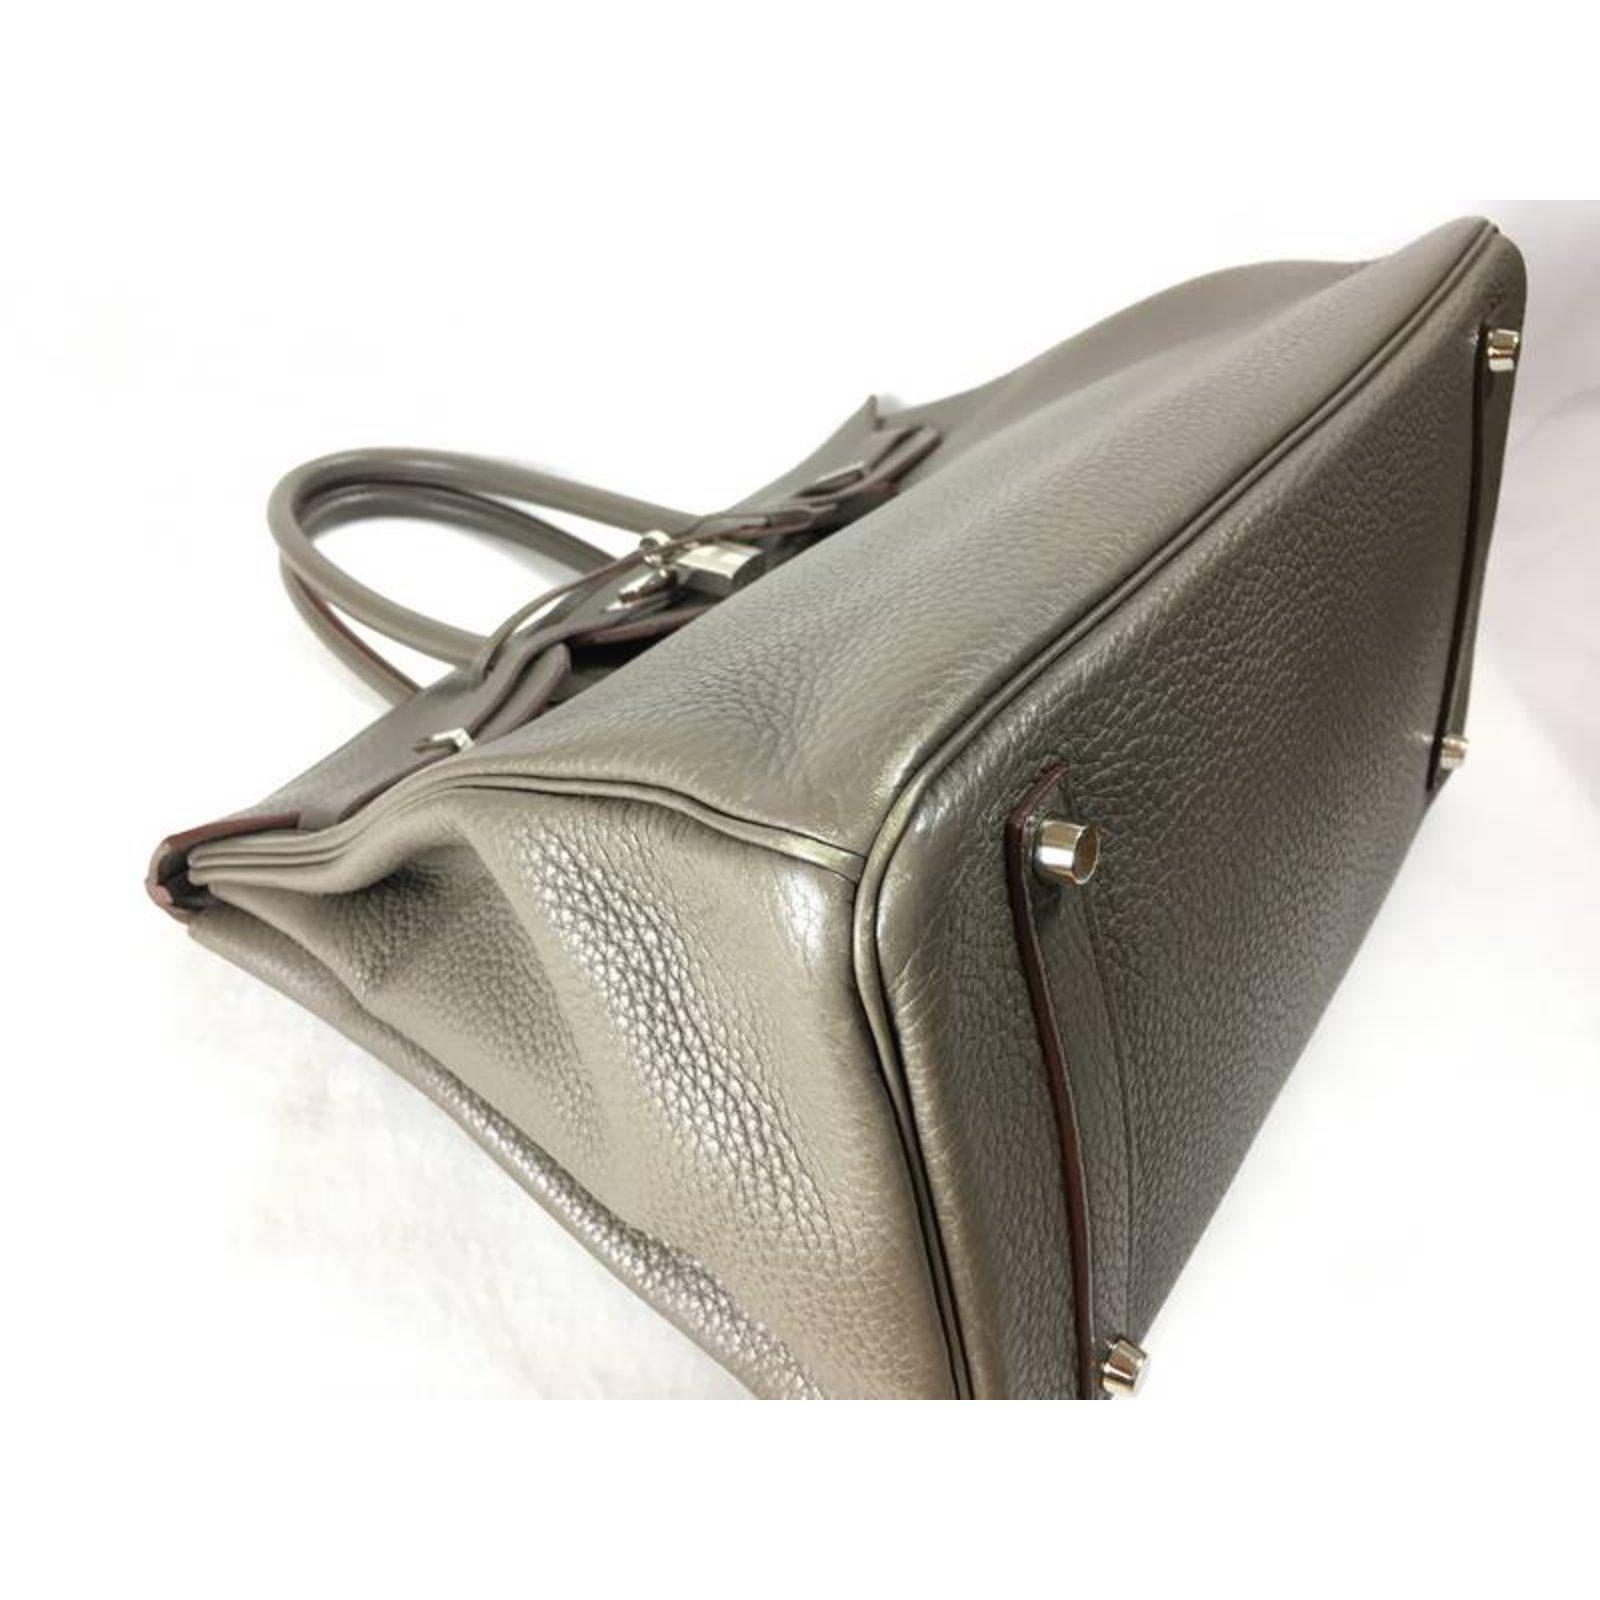 d57e12eec61c new style hermes etain evelyne iii 33 messenger bag 146b4 4d347  coupon  code for sacs à main hermès hermes birkin 35 clemence etain shw cuir gris  ref